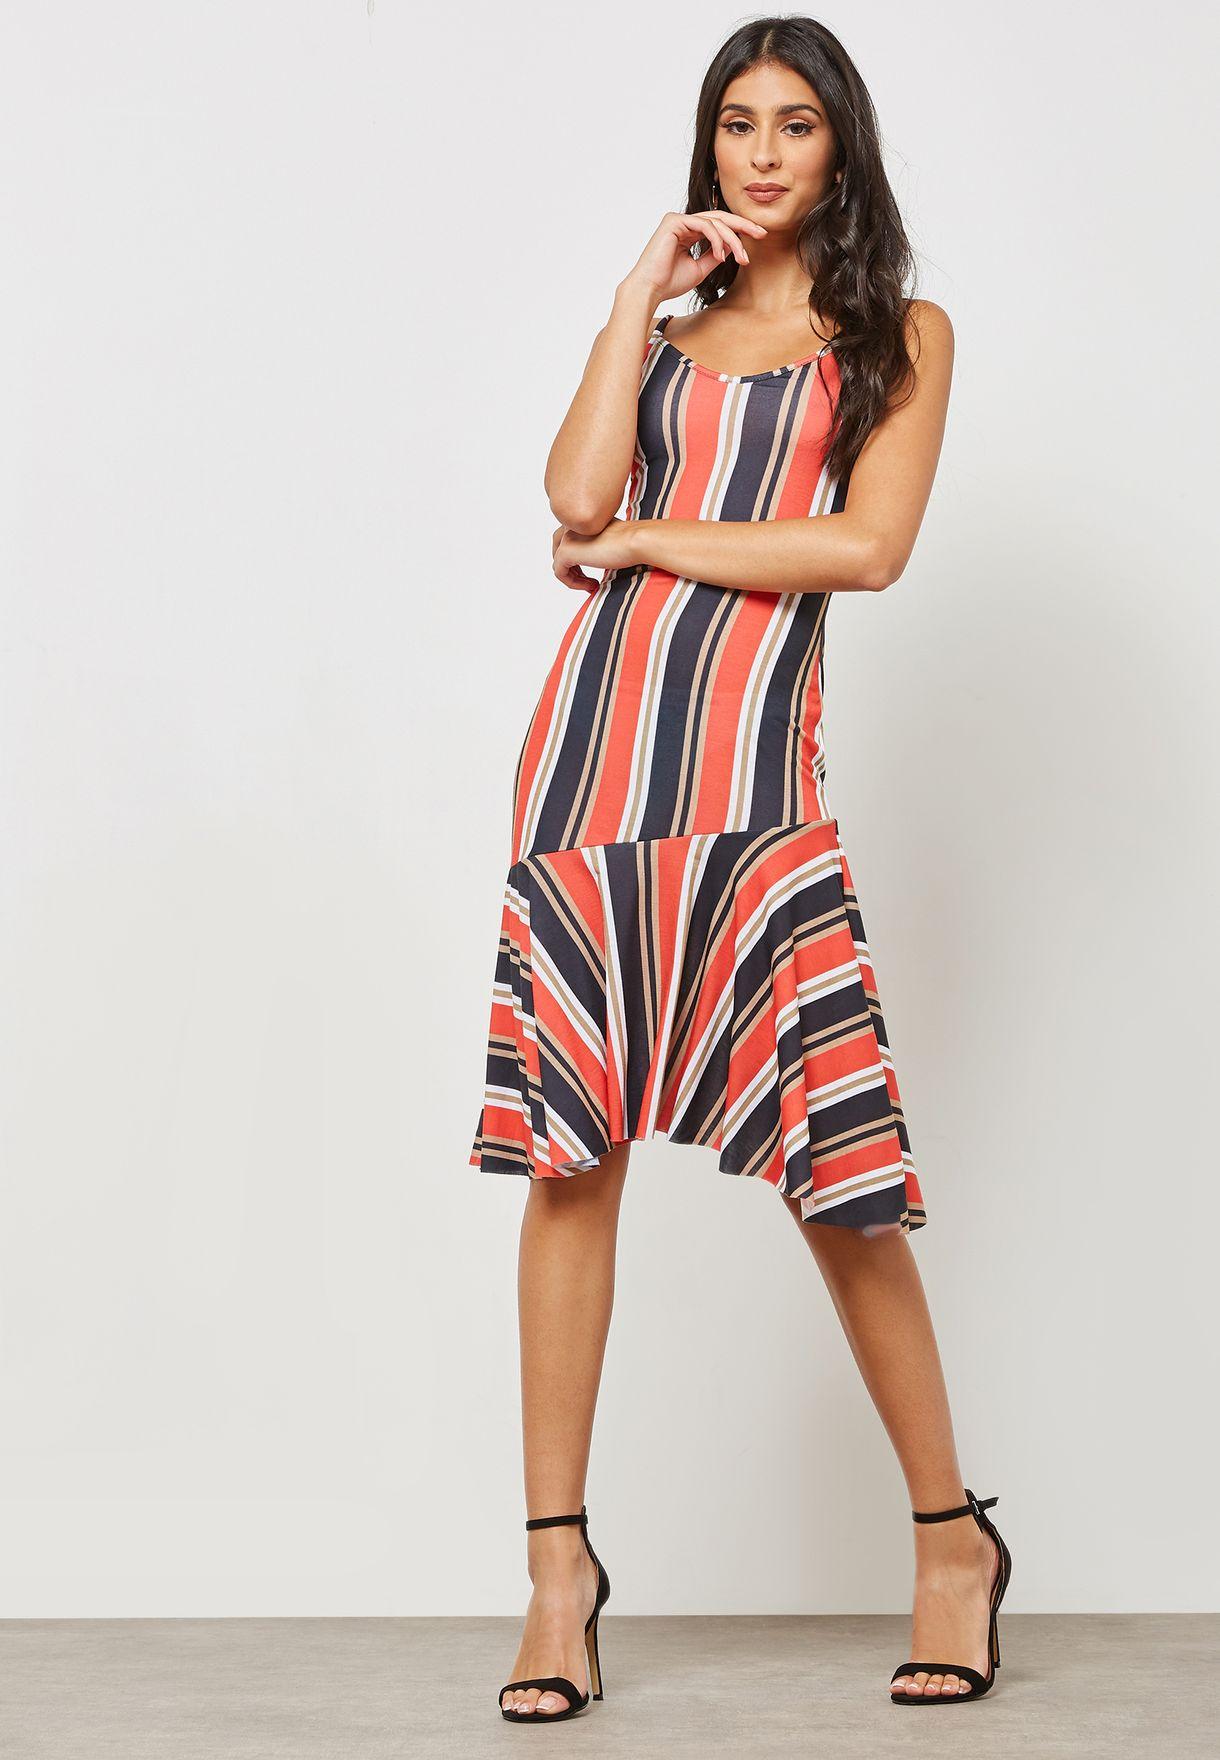 فستان بحمالات وخطوط